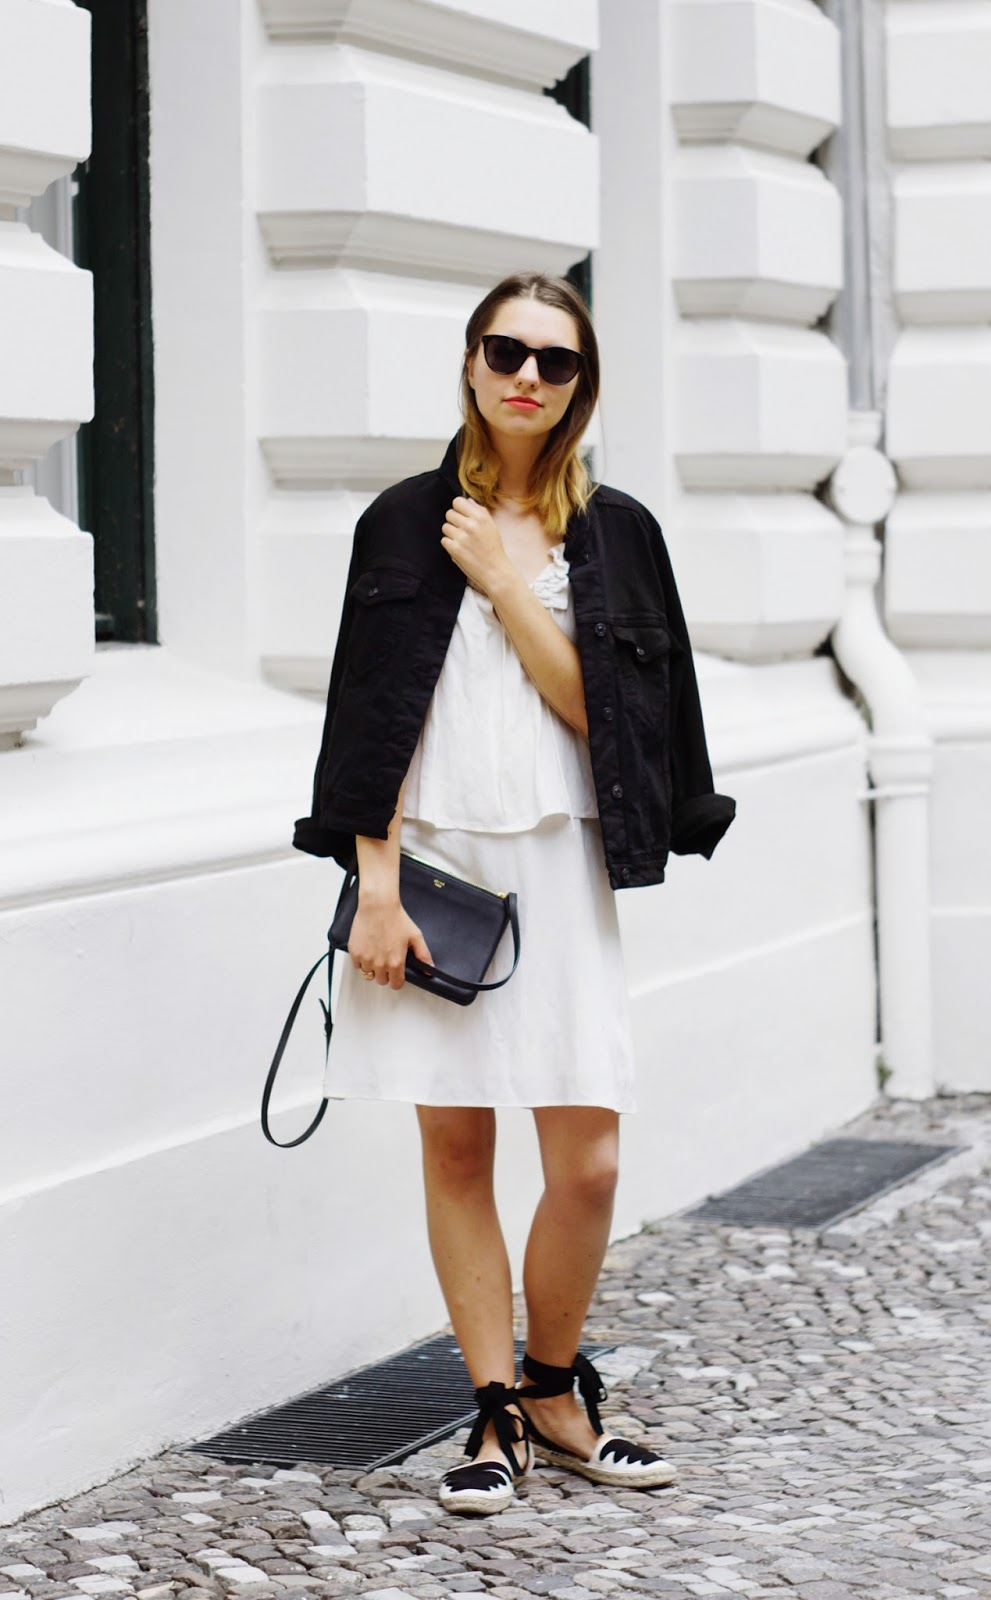 017fa23ad2012 Outfit: Linen Dress and Black Denim Jacket | CRUEL * THING | Bloglovin'